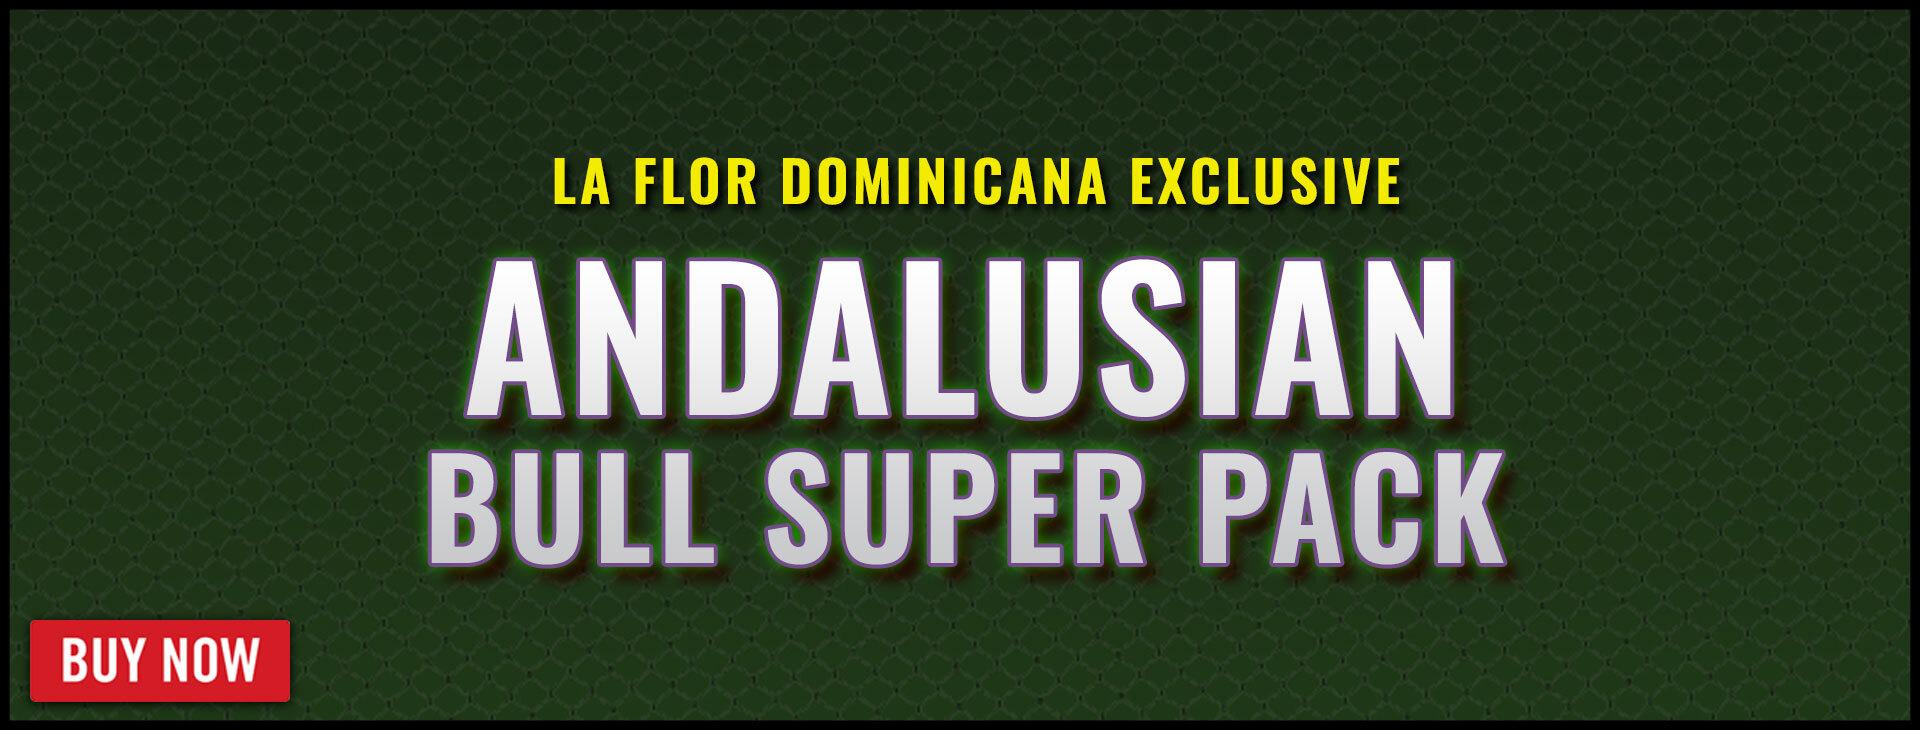 LFD Andalusian Bull Cigar Of The Year Sampler